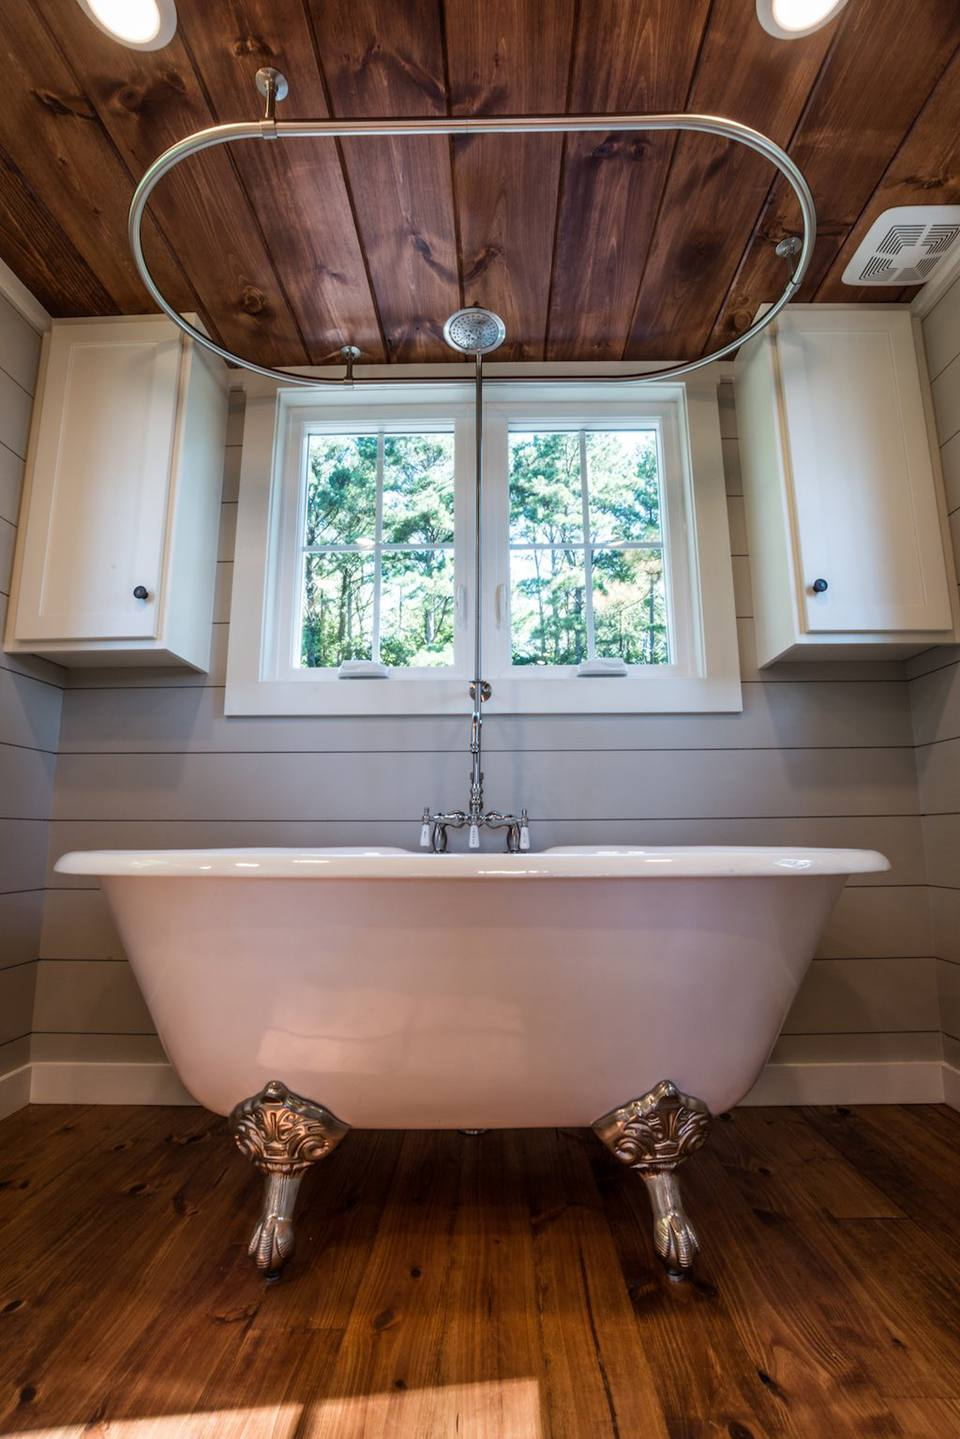 Rustic Bathrooms With Clawfoot Tubs